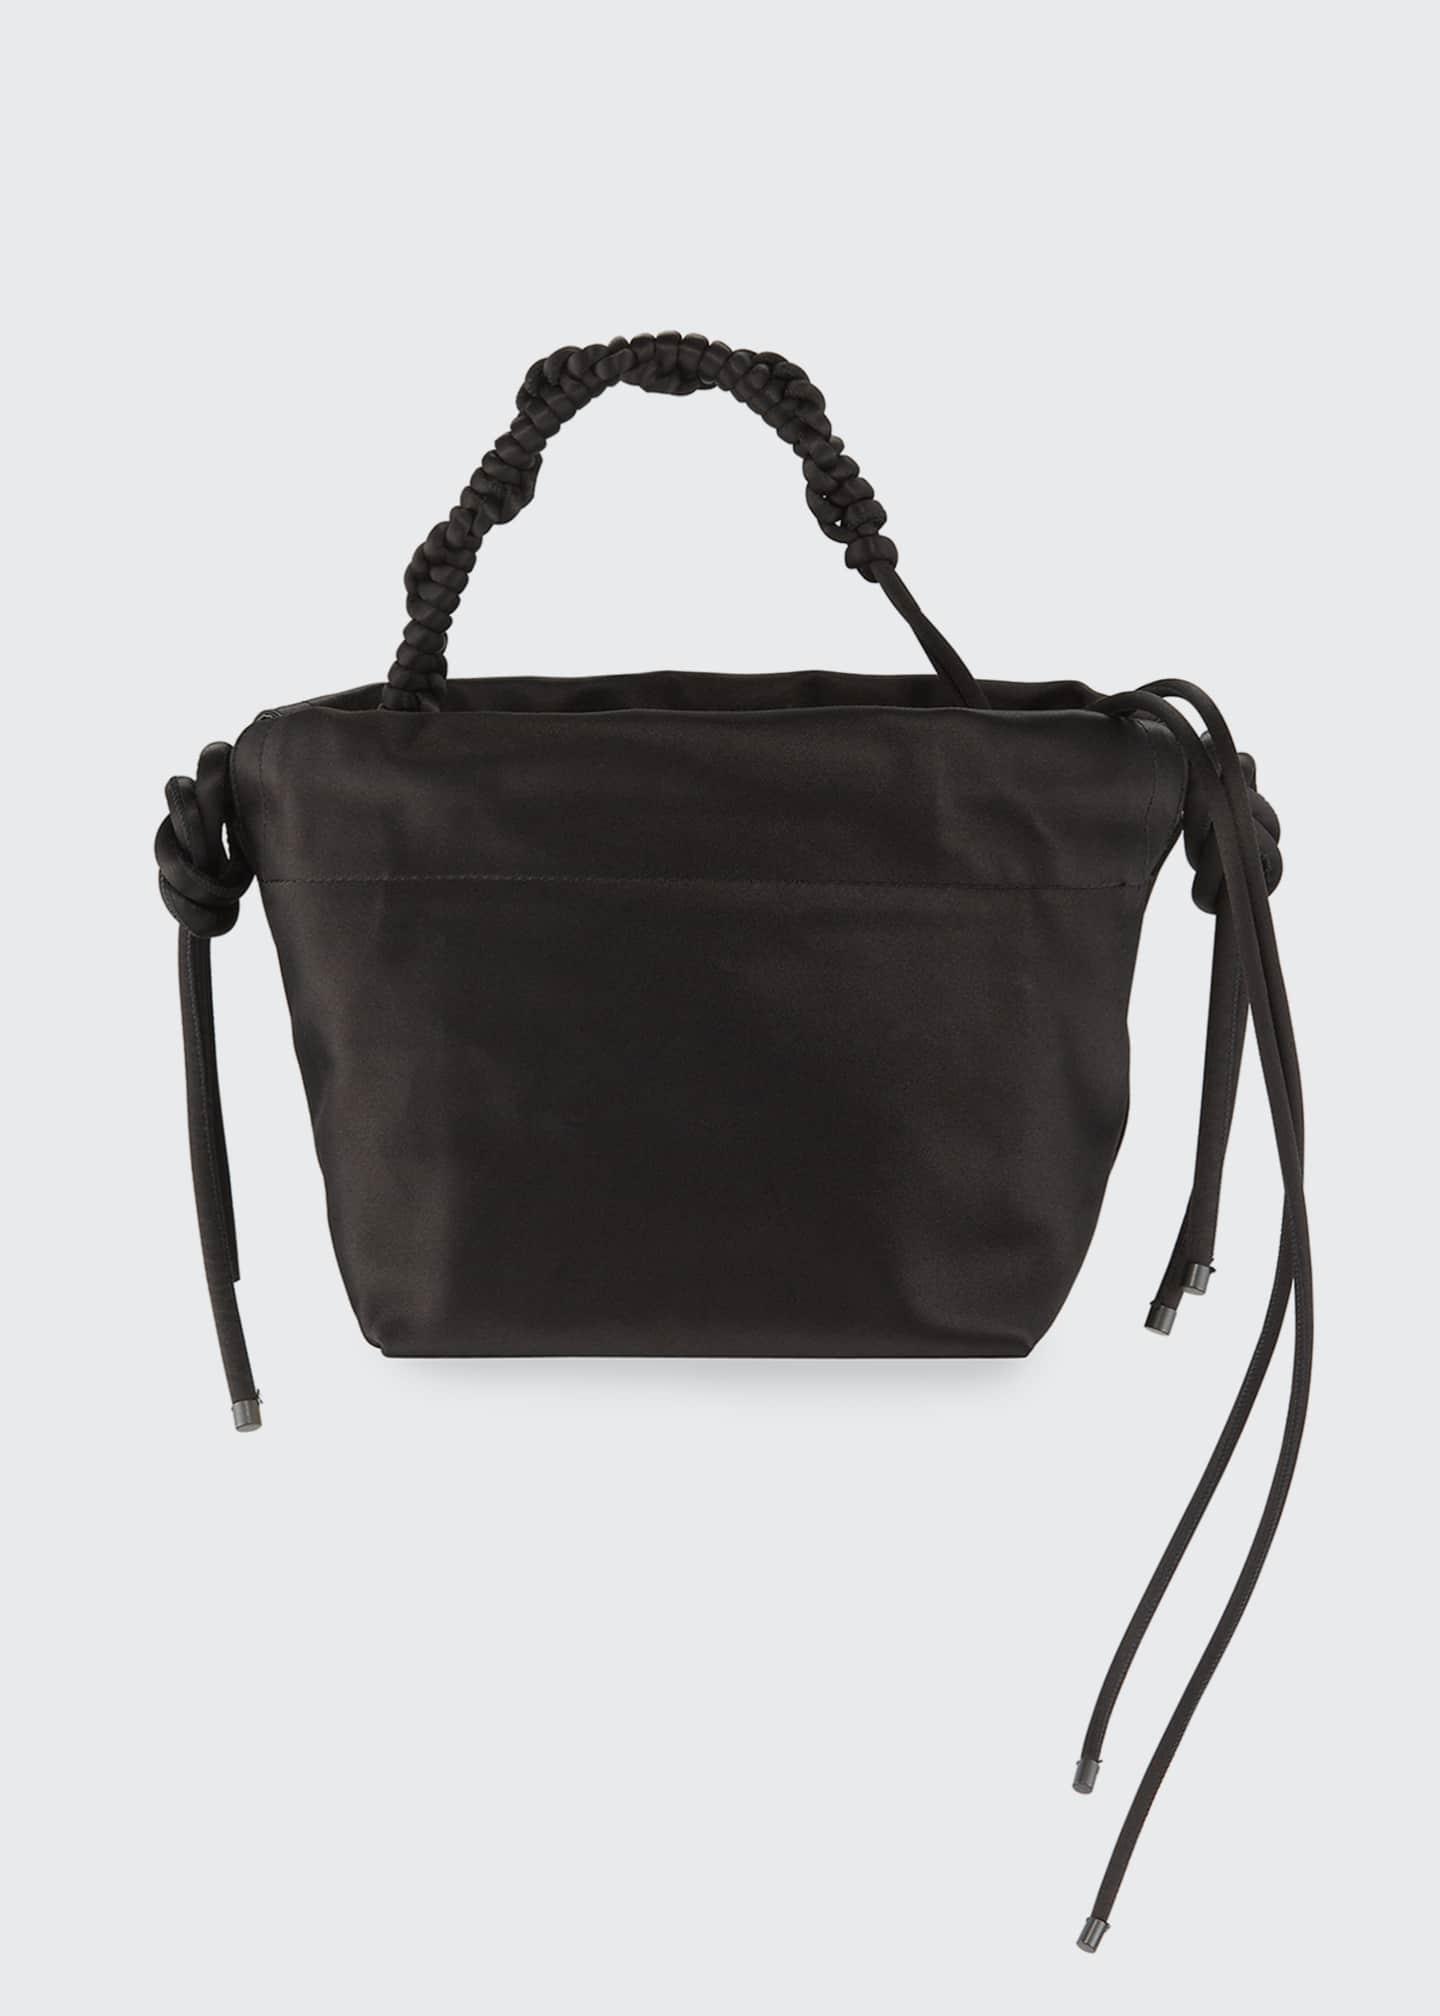 Dries Van Noten Satin Drawstring Bucket Bag